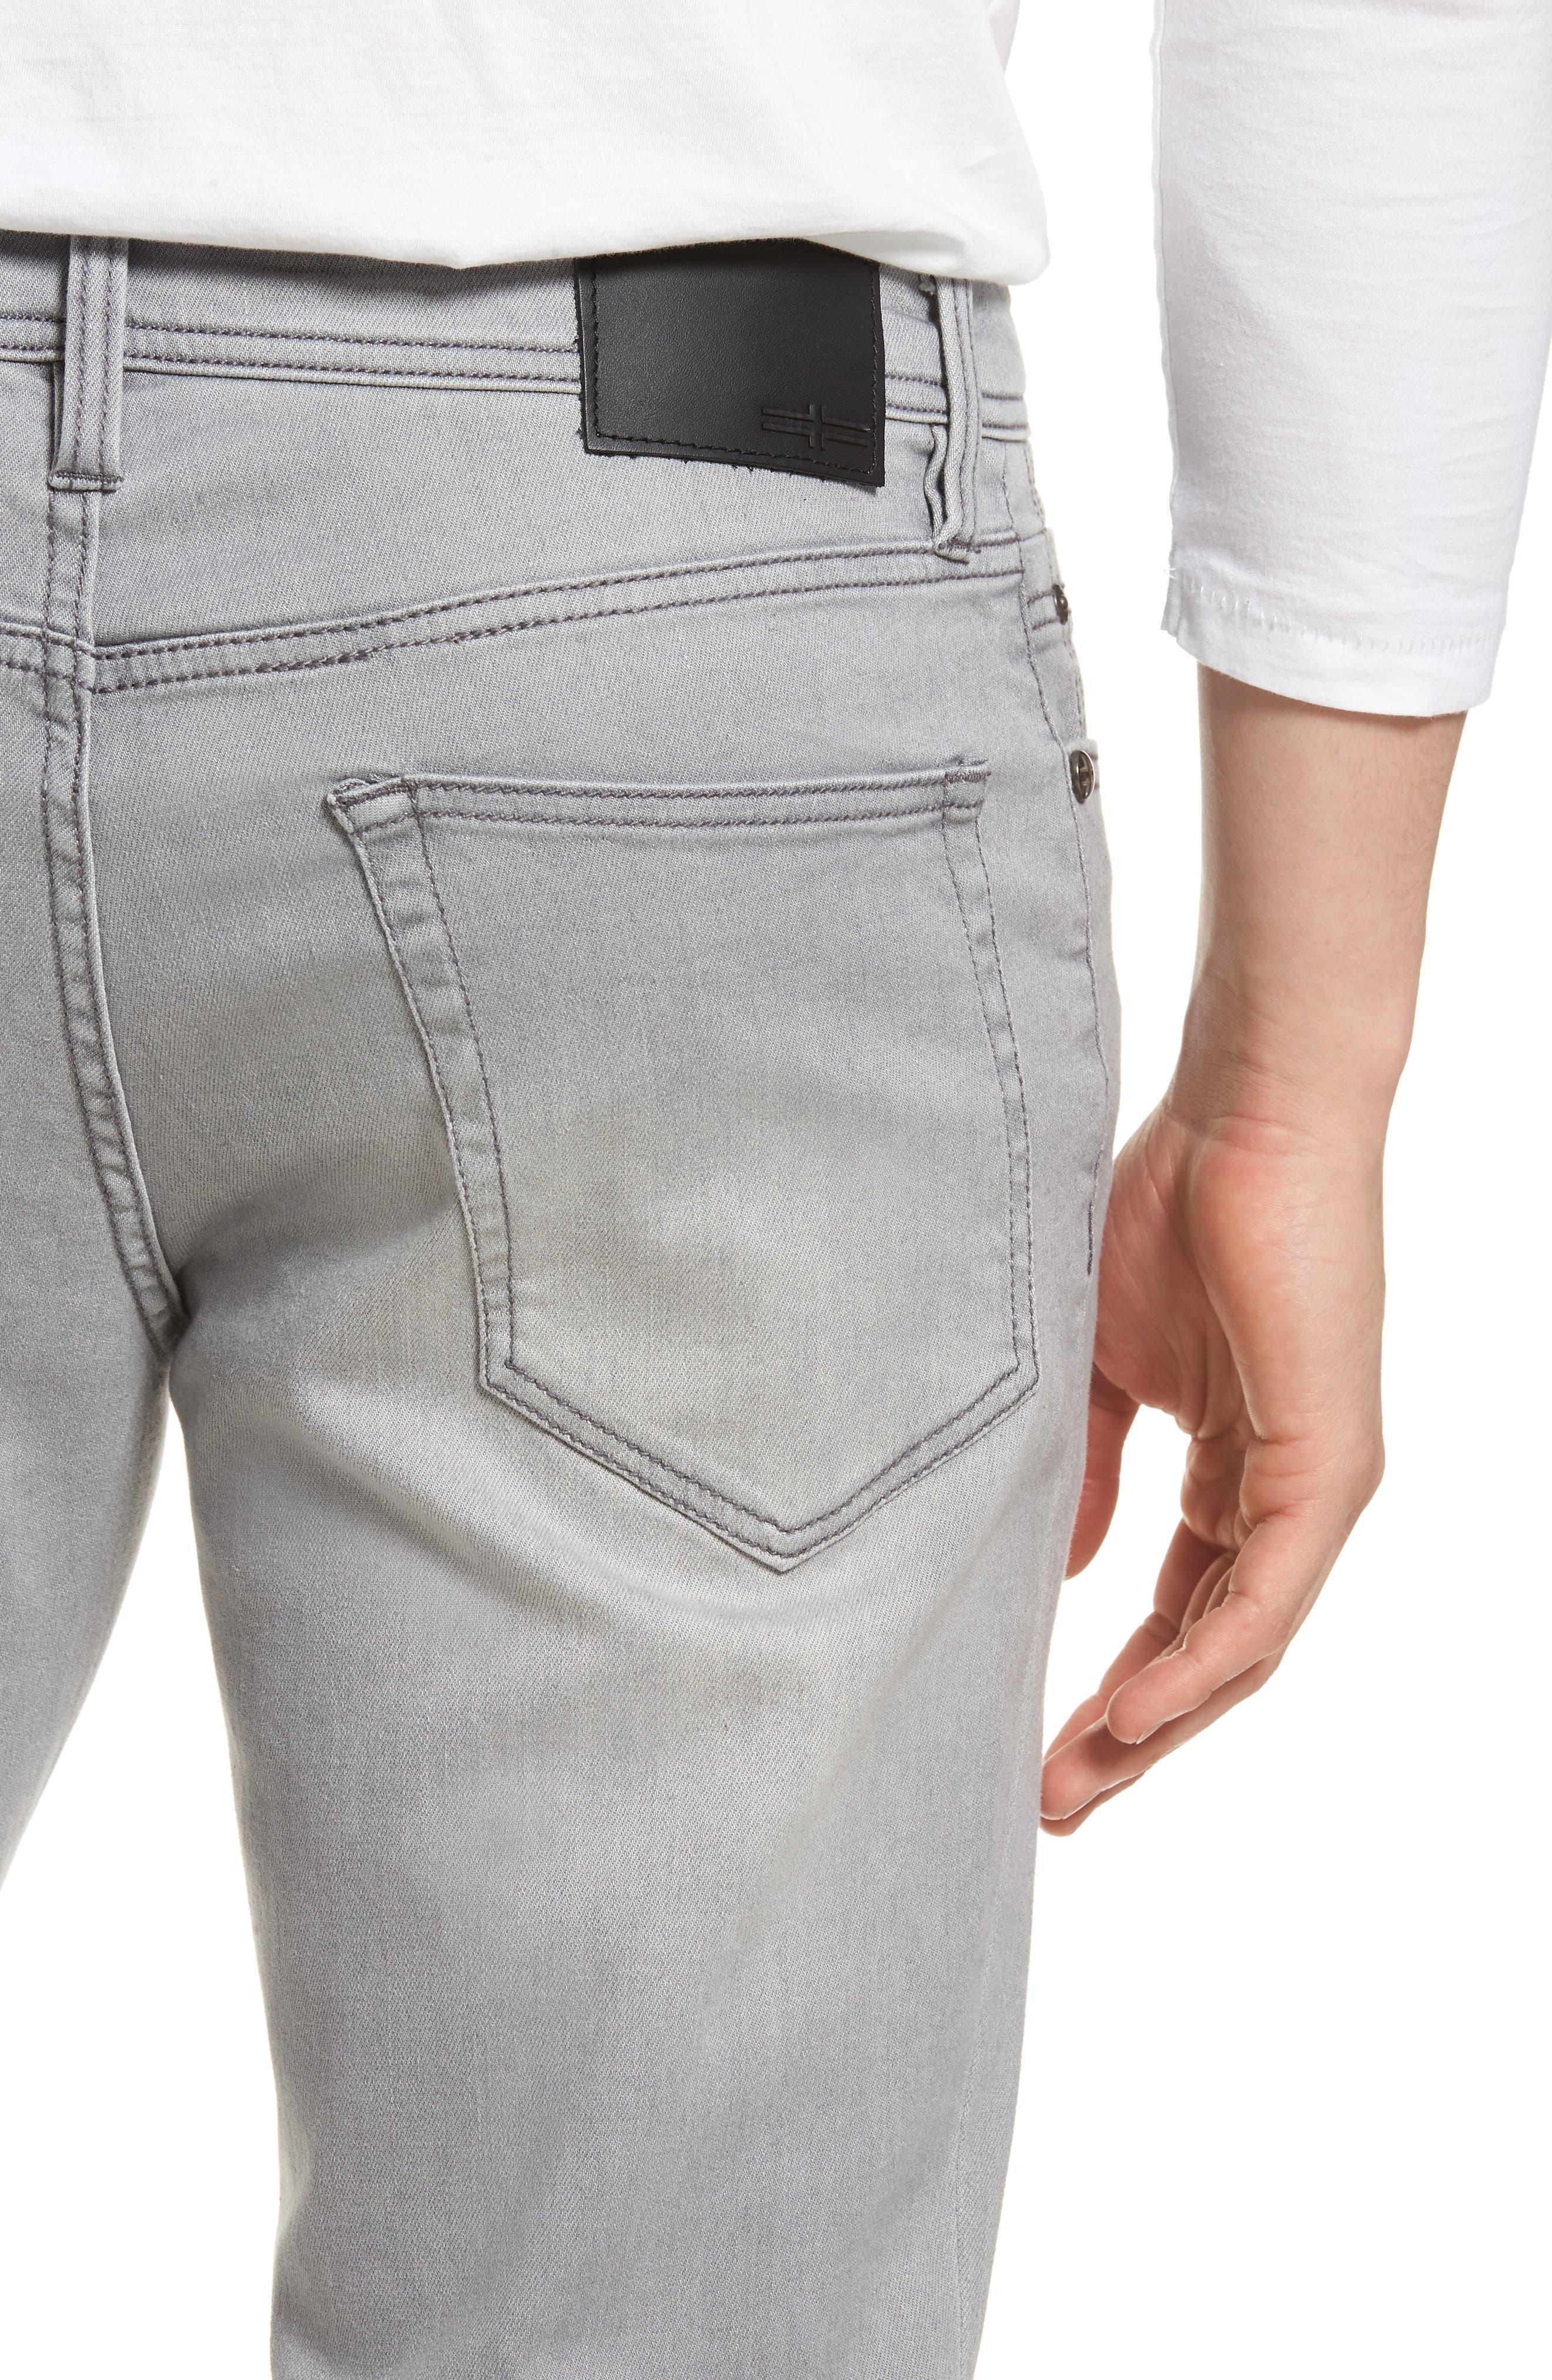 Jeans Co. Kingston Slim Straight Leg Jeans,                             Alternate thumbnail 4, color,                             COAL MINE DARK